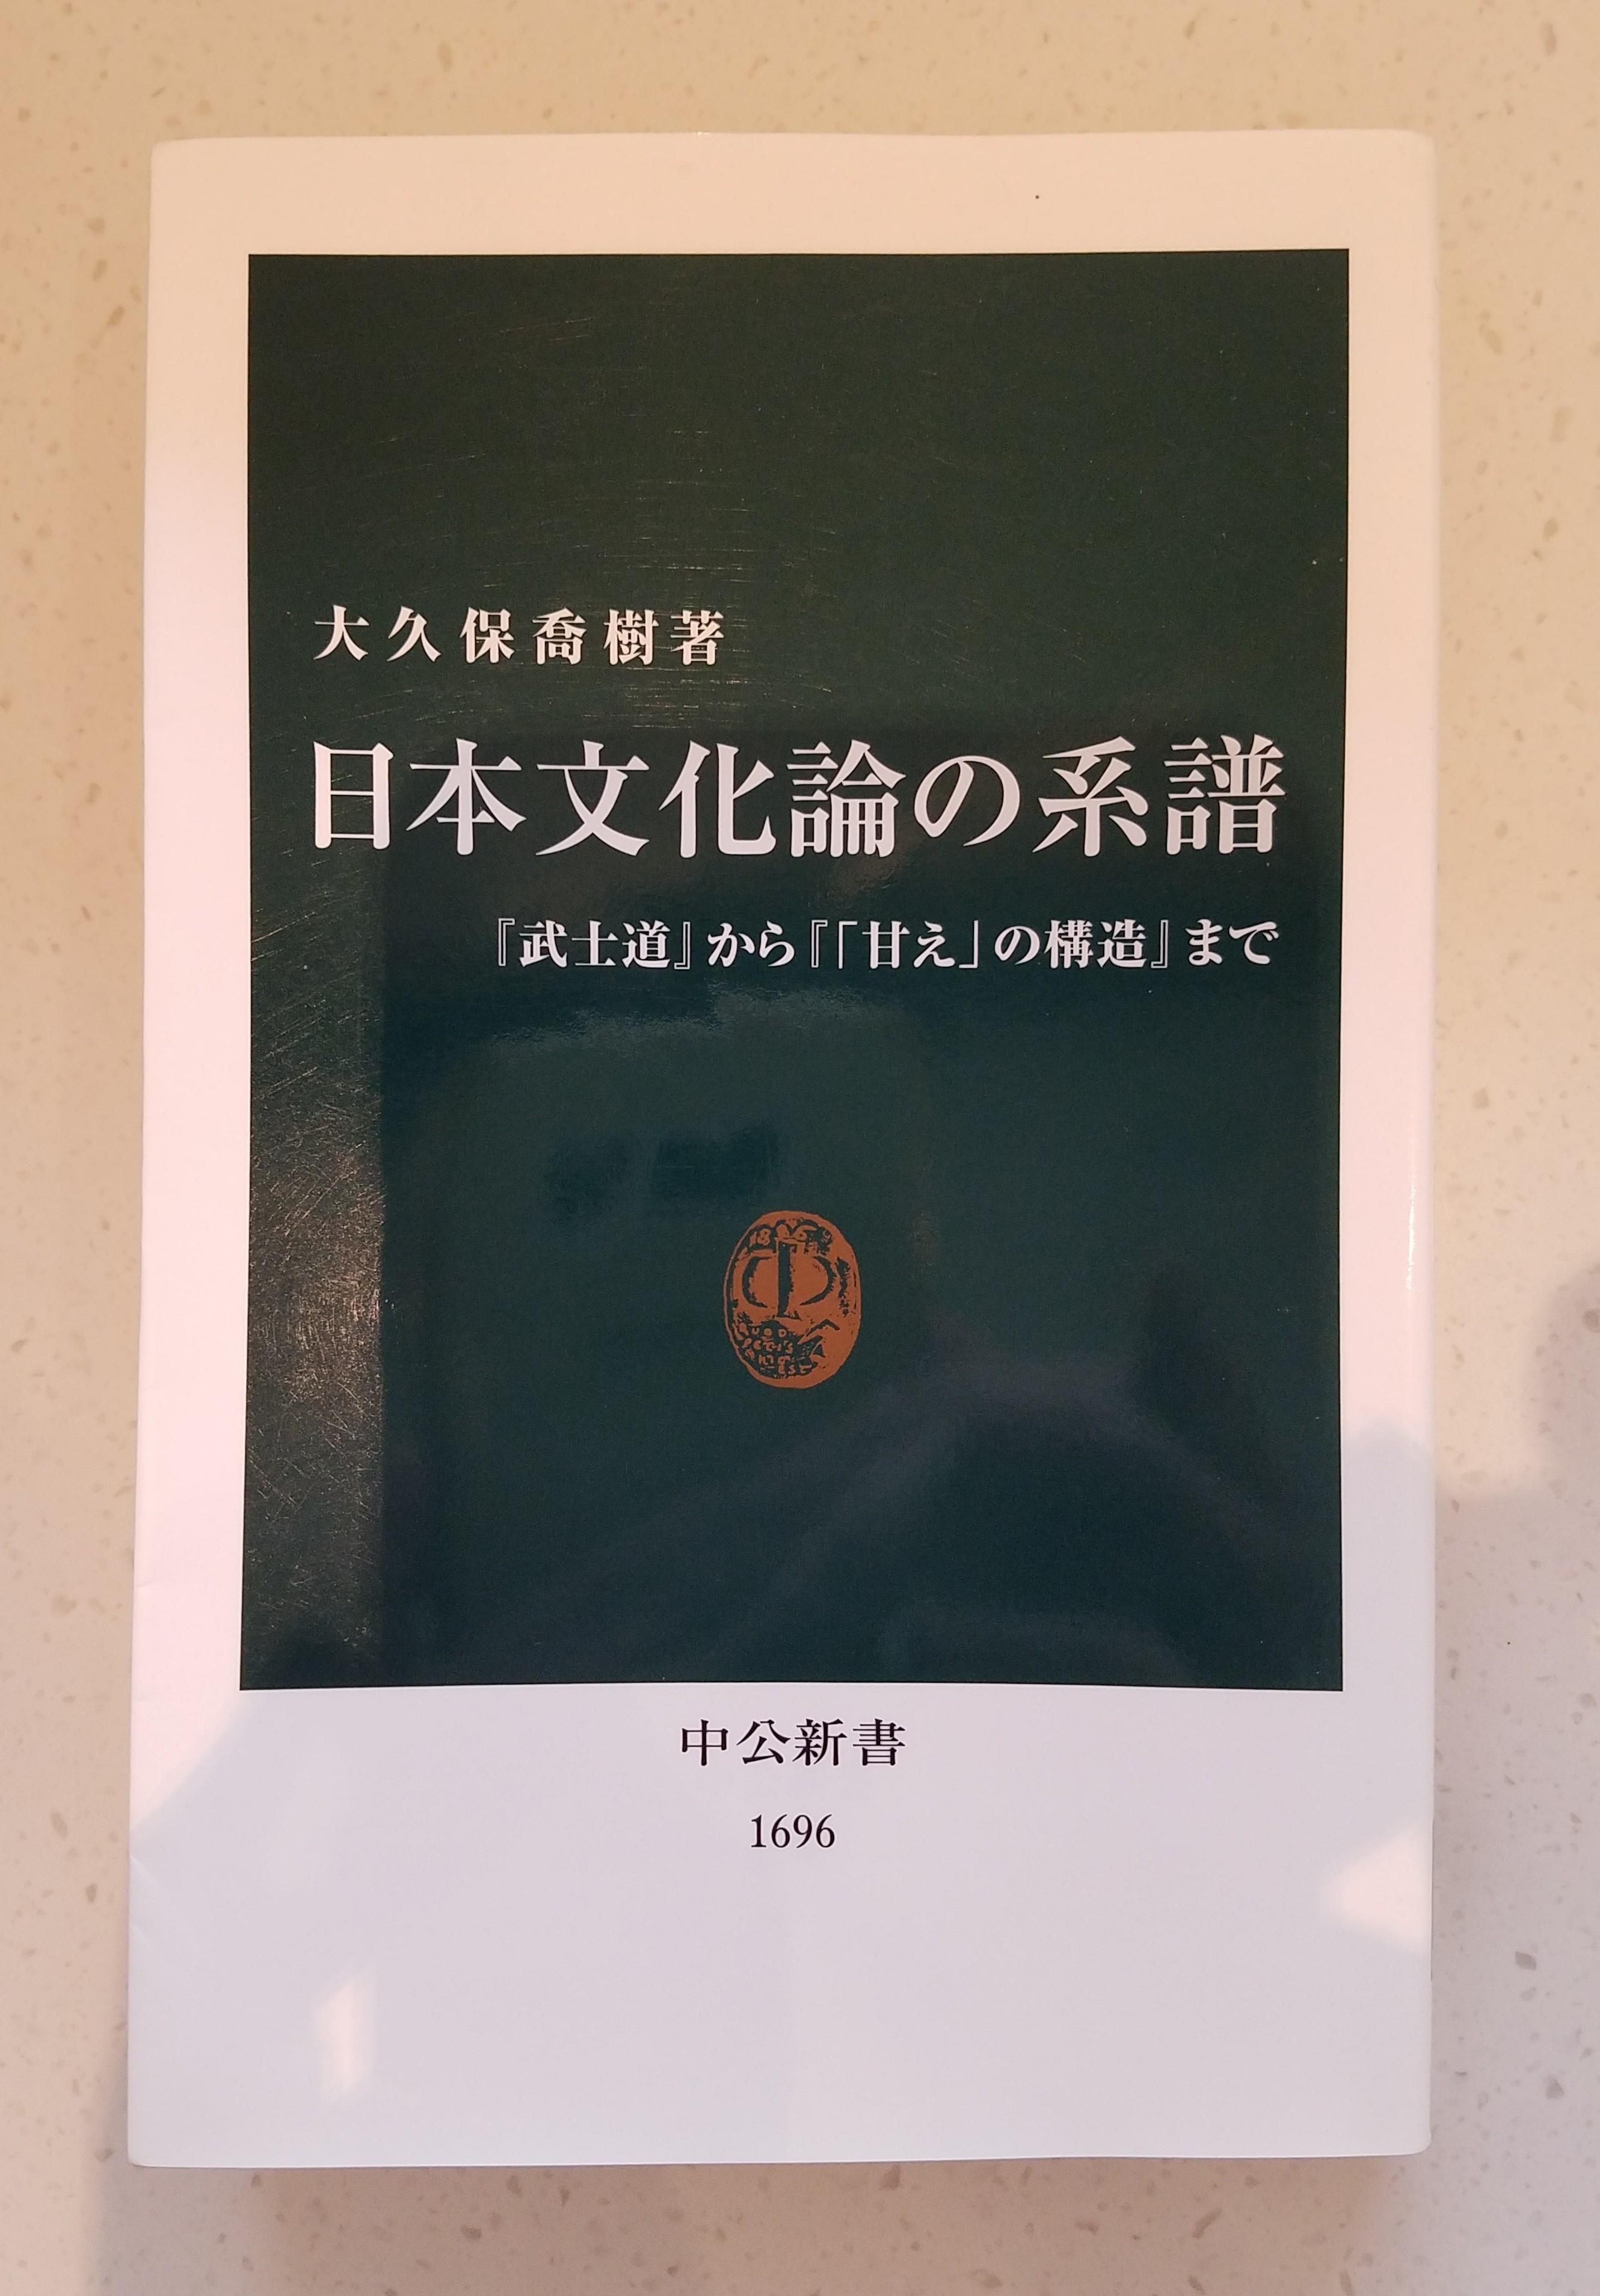 大久保喬樹『日本文化論の系譜』...